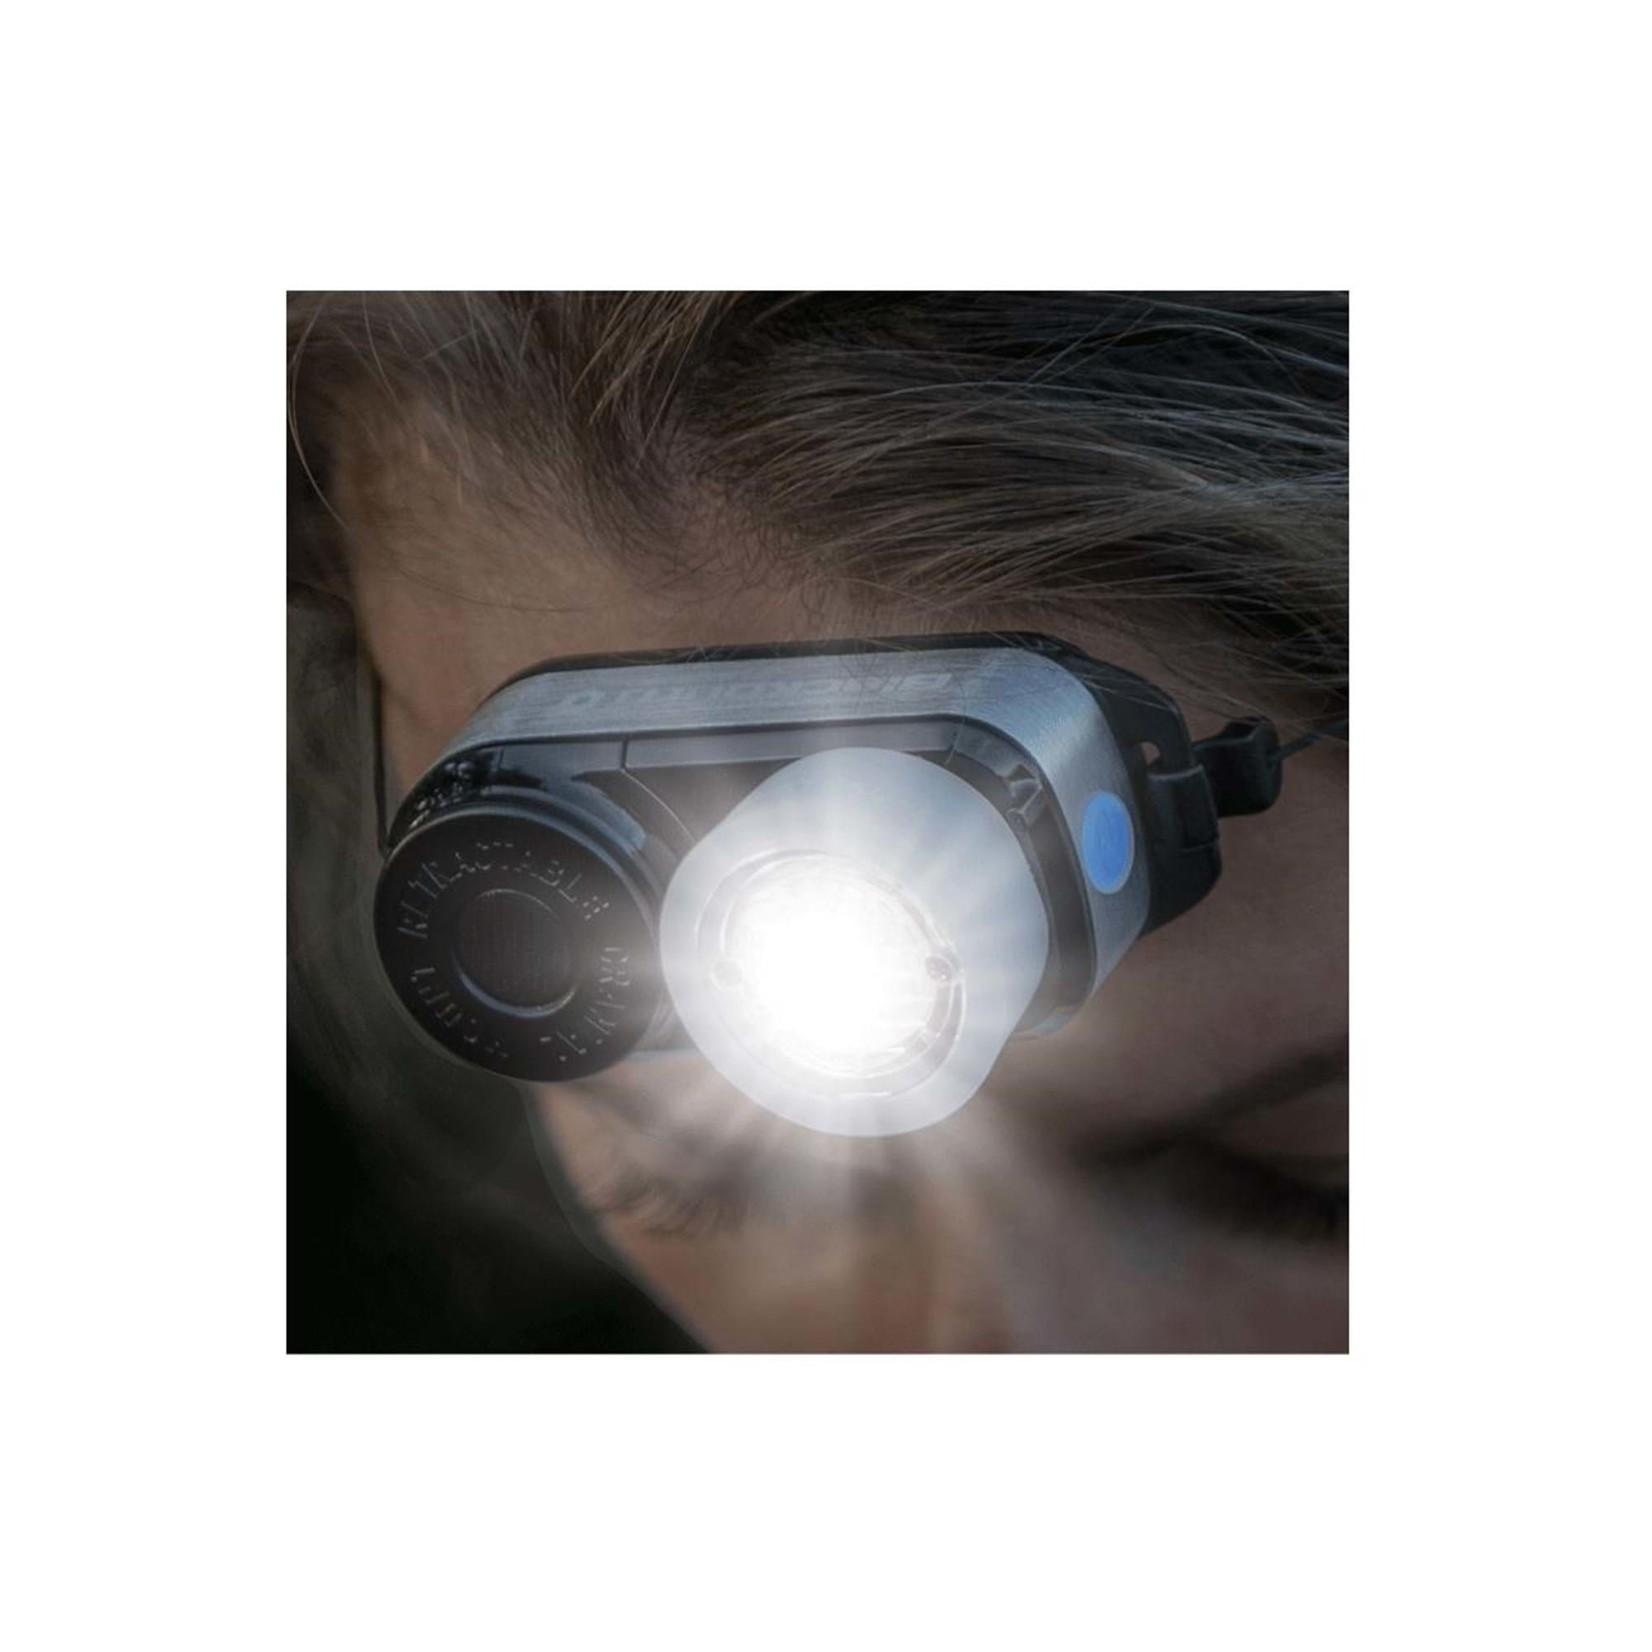 blackburn BLACKBURN OUTPOST BIKE & CAMP FRONT LIGHT